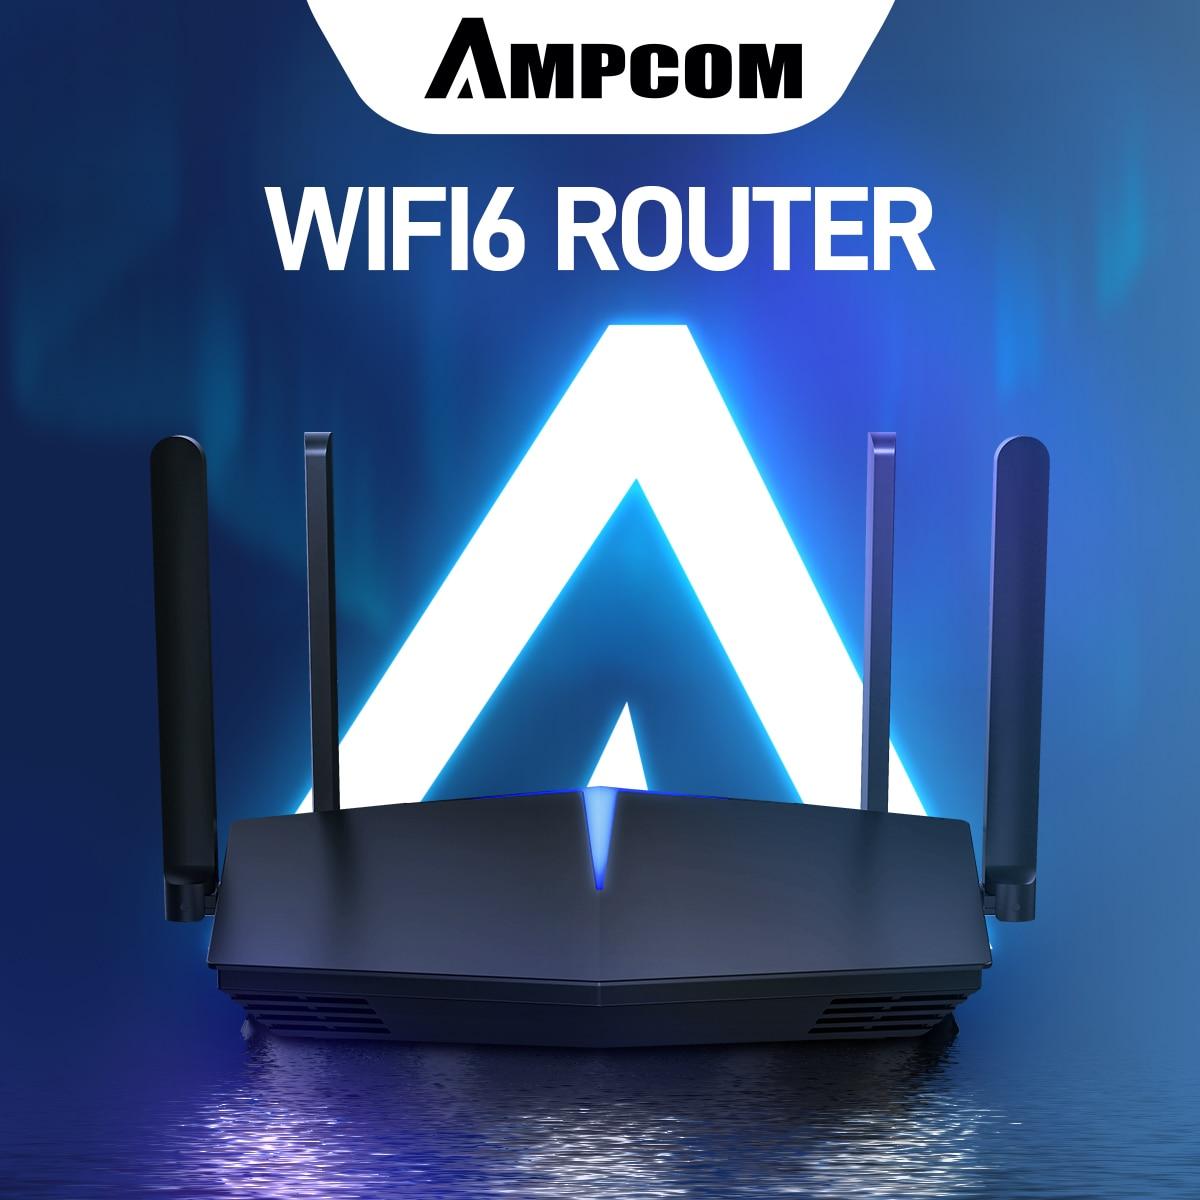 AMPCOM-راوتر واي فاي ذكي AX1800 ، wi-fi ، Qualcomm 5-core ، wi-fi 6 ، 2.4/5.0 جيجاهرتز ، ثنائي التردد ، 5 جيجاهرتز ، للمنزل